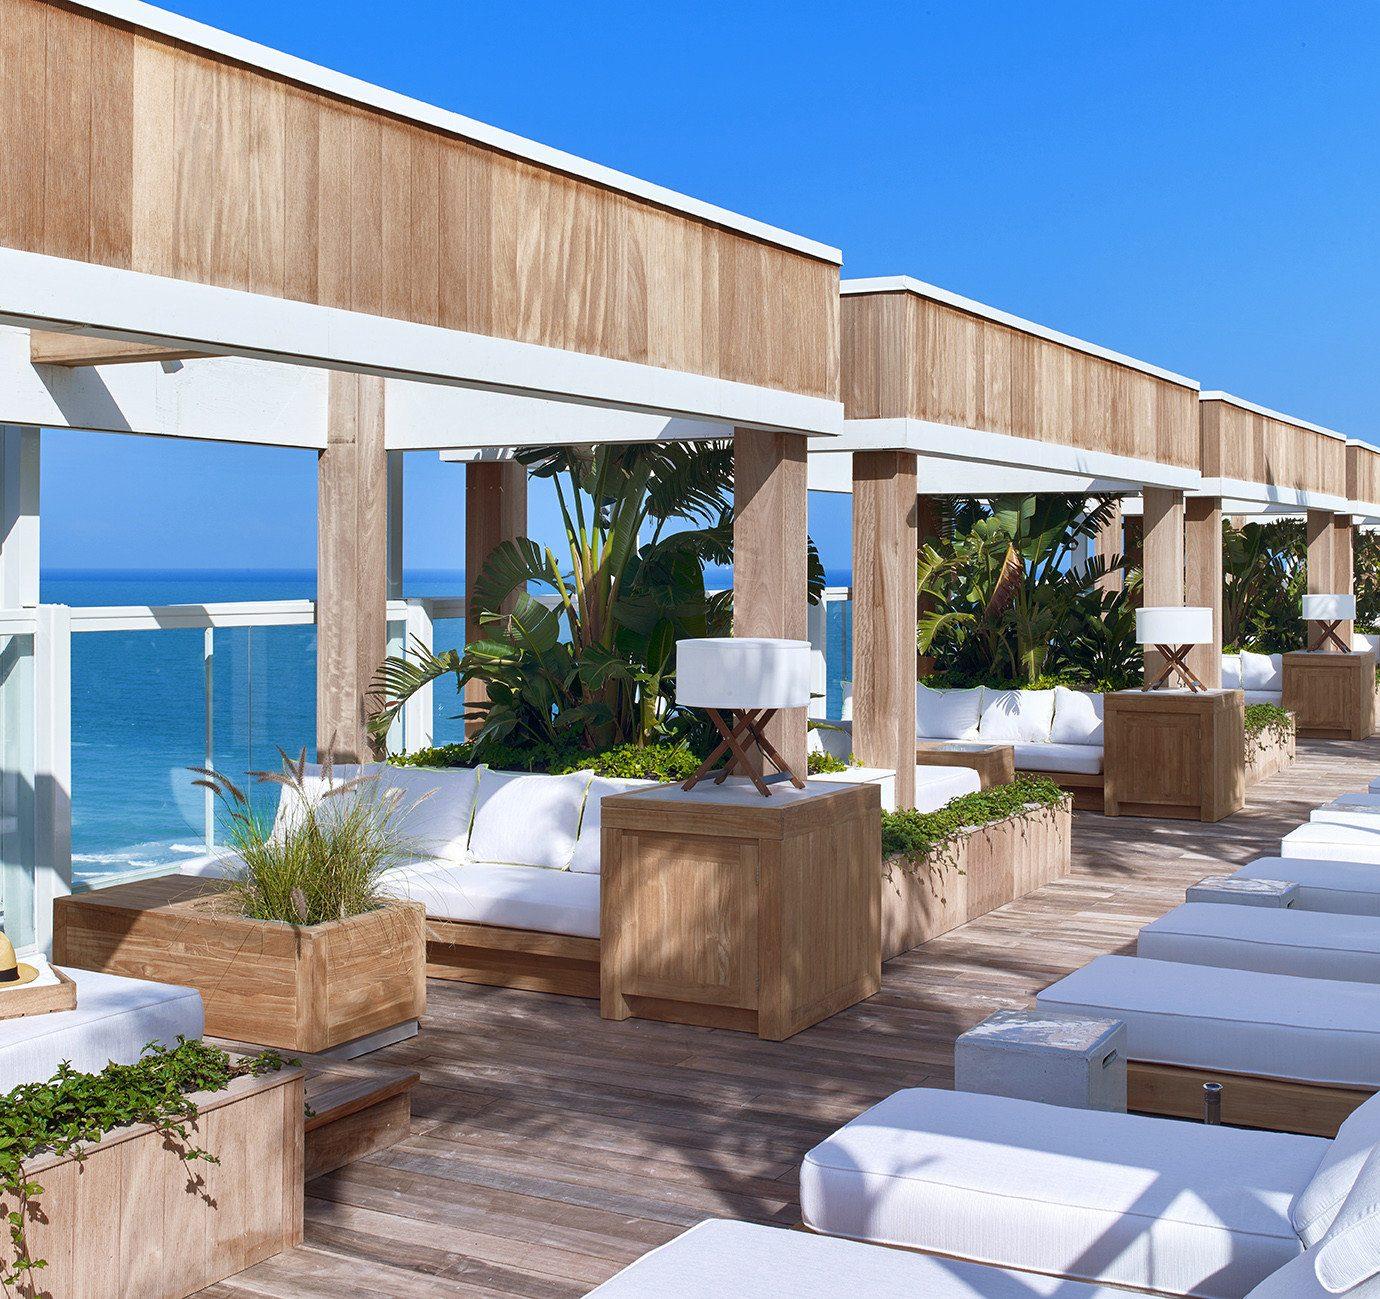 building property swimming pool home Resort condominium Villa outdoor structure pergola backyard Deck colonnade